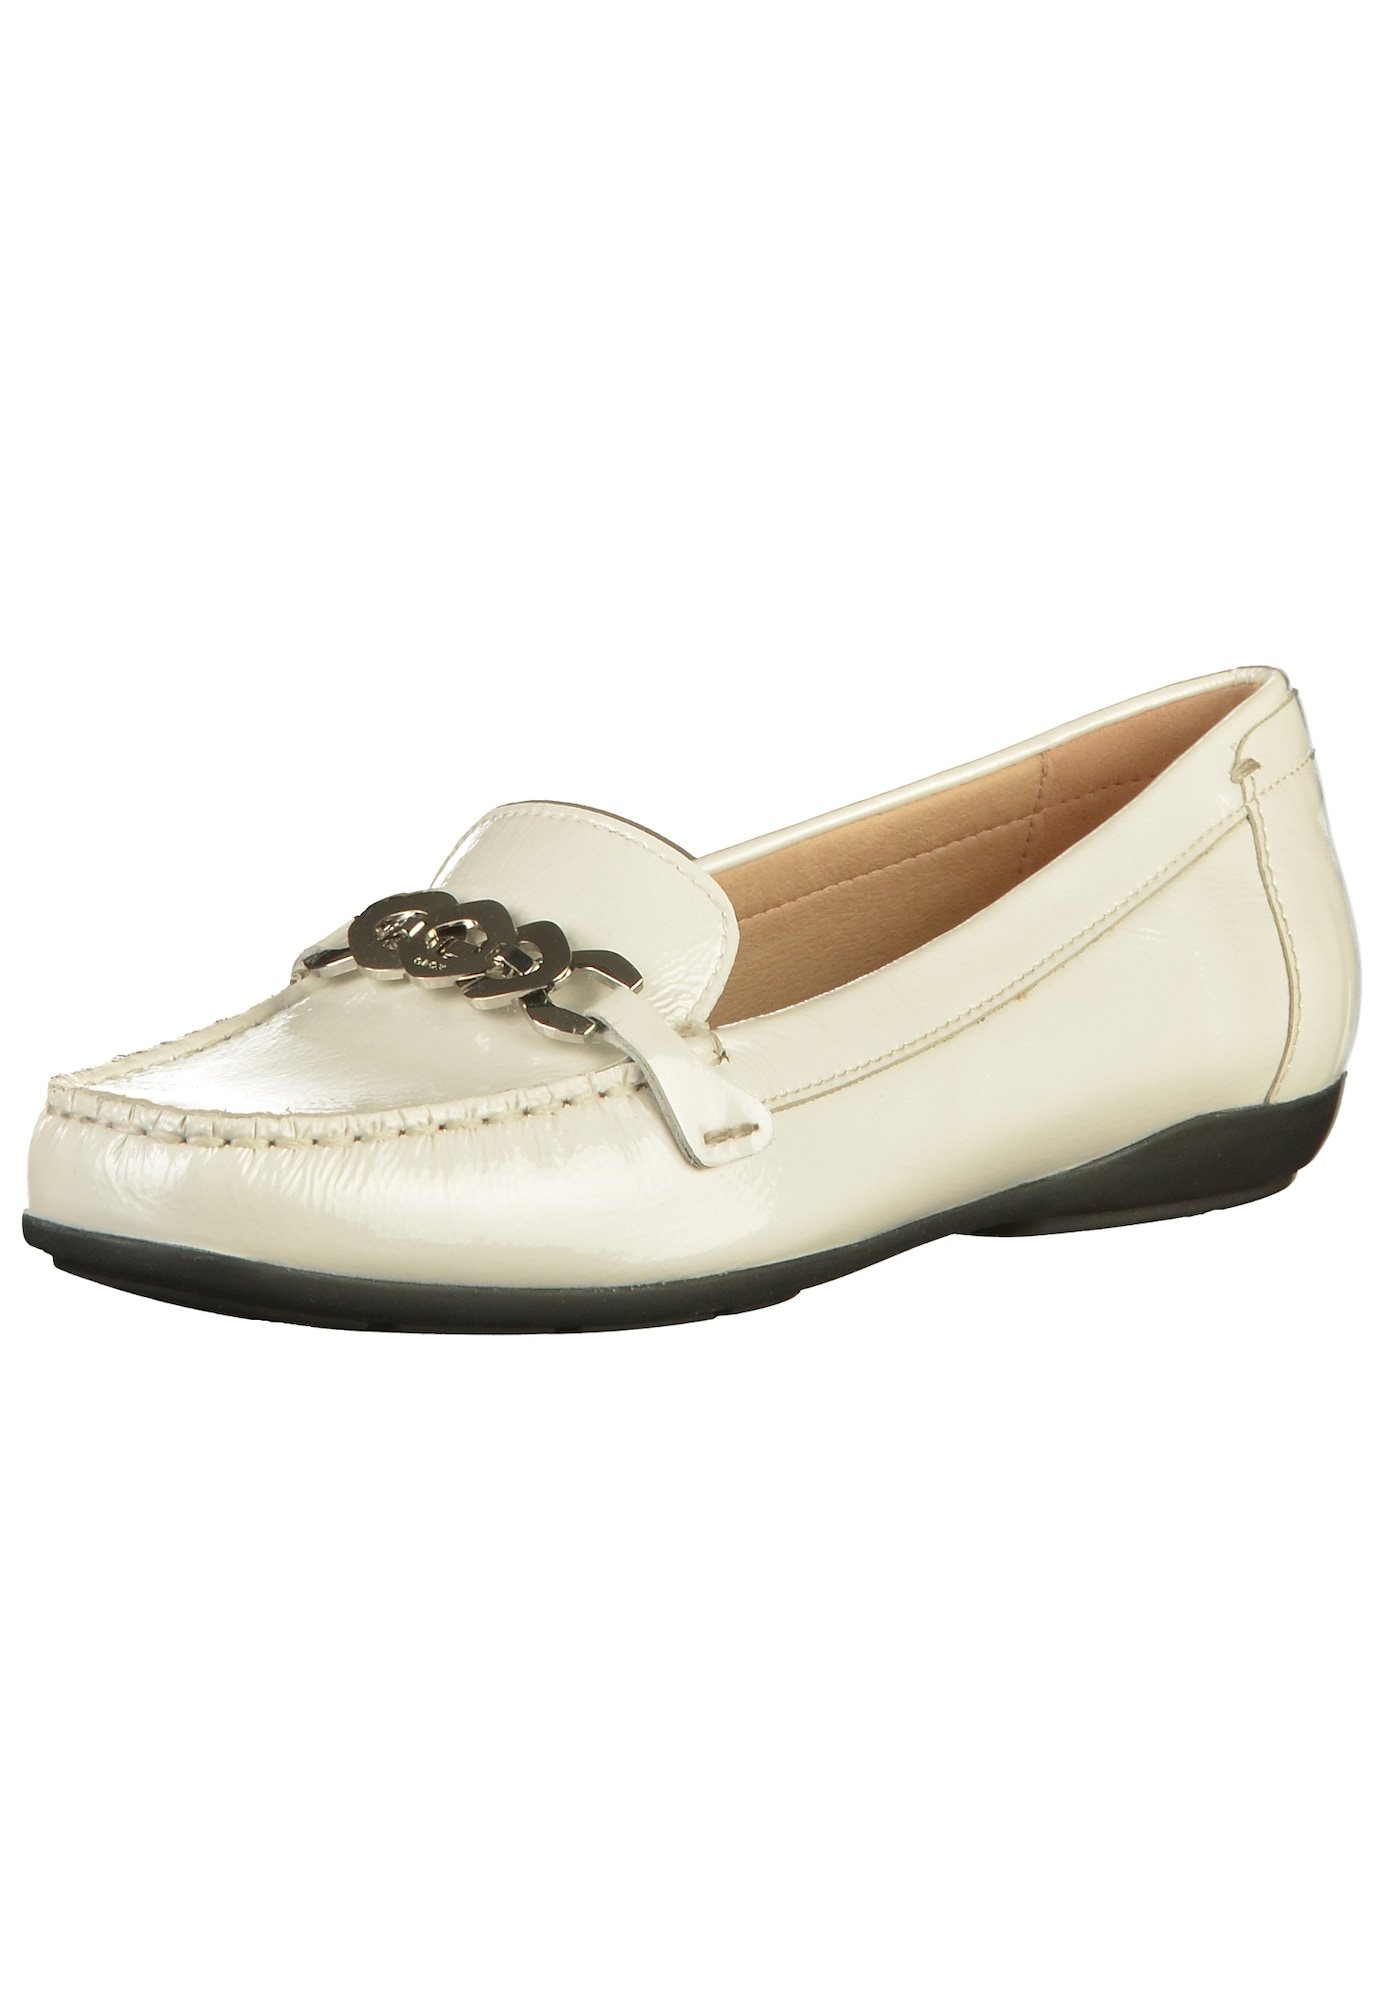 Mokassin | Schuhe > Mokassins | Weiß | Geox